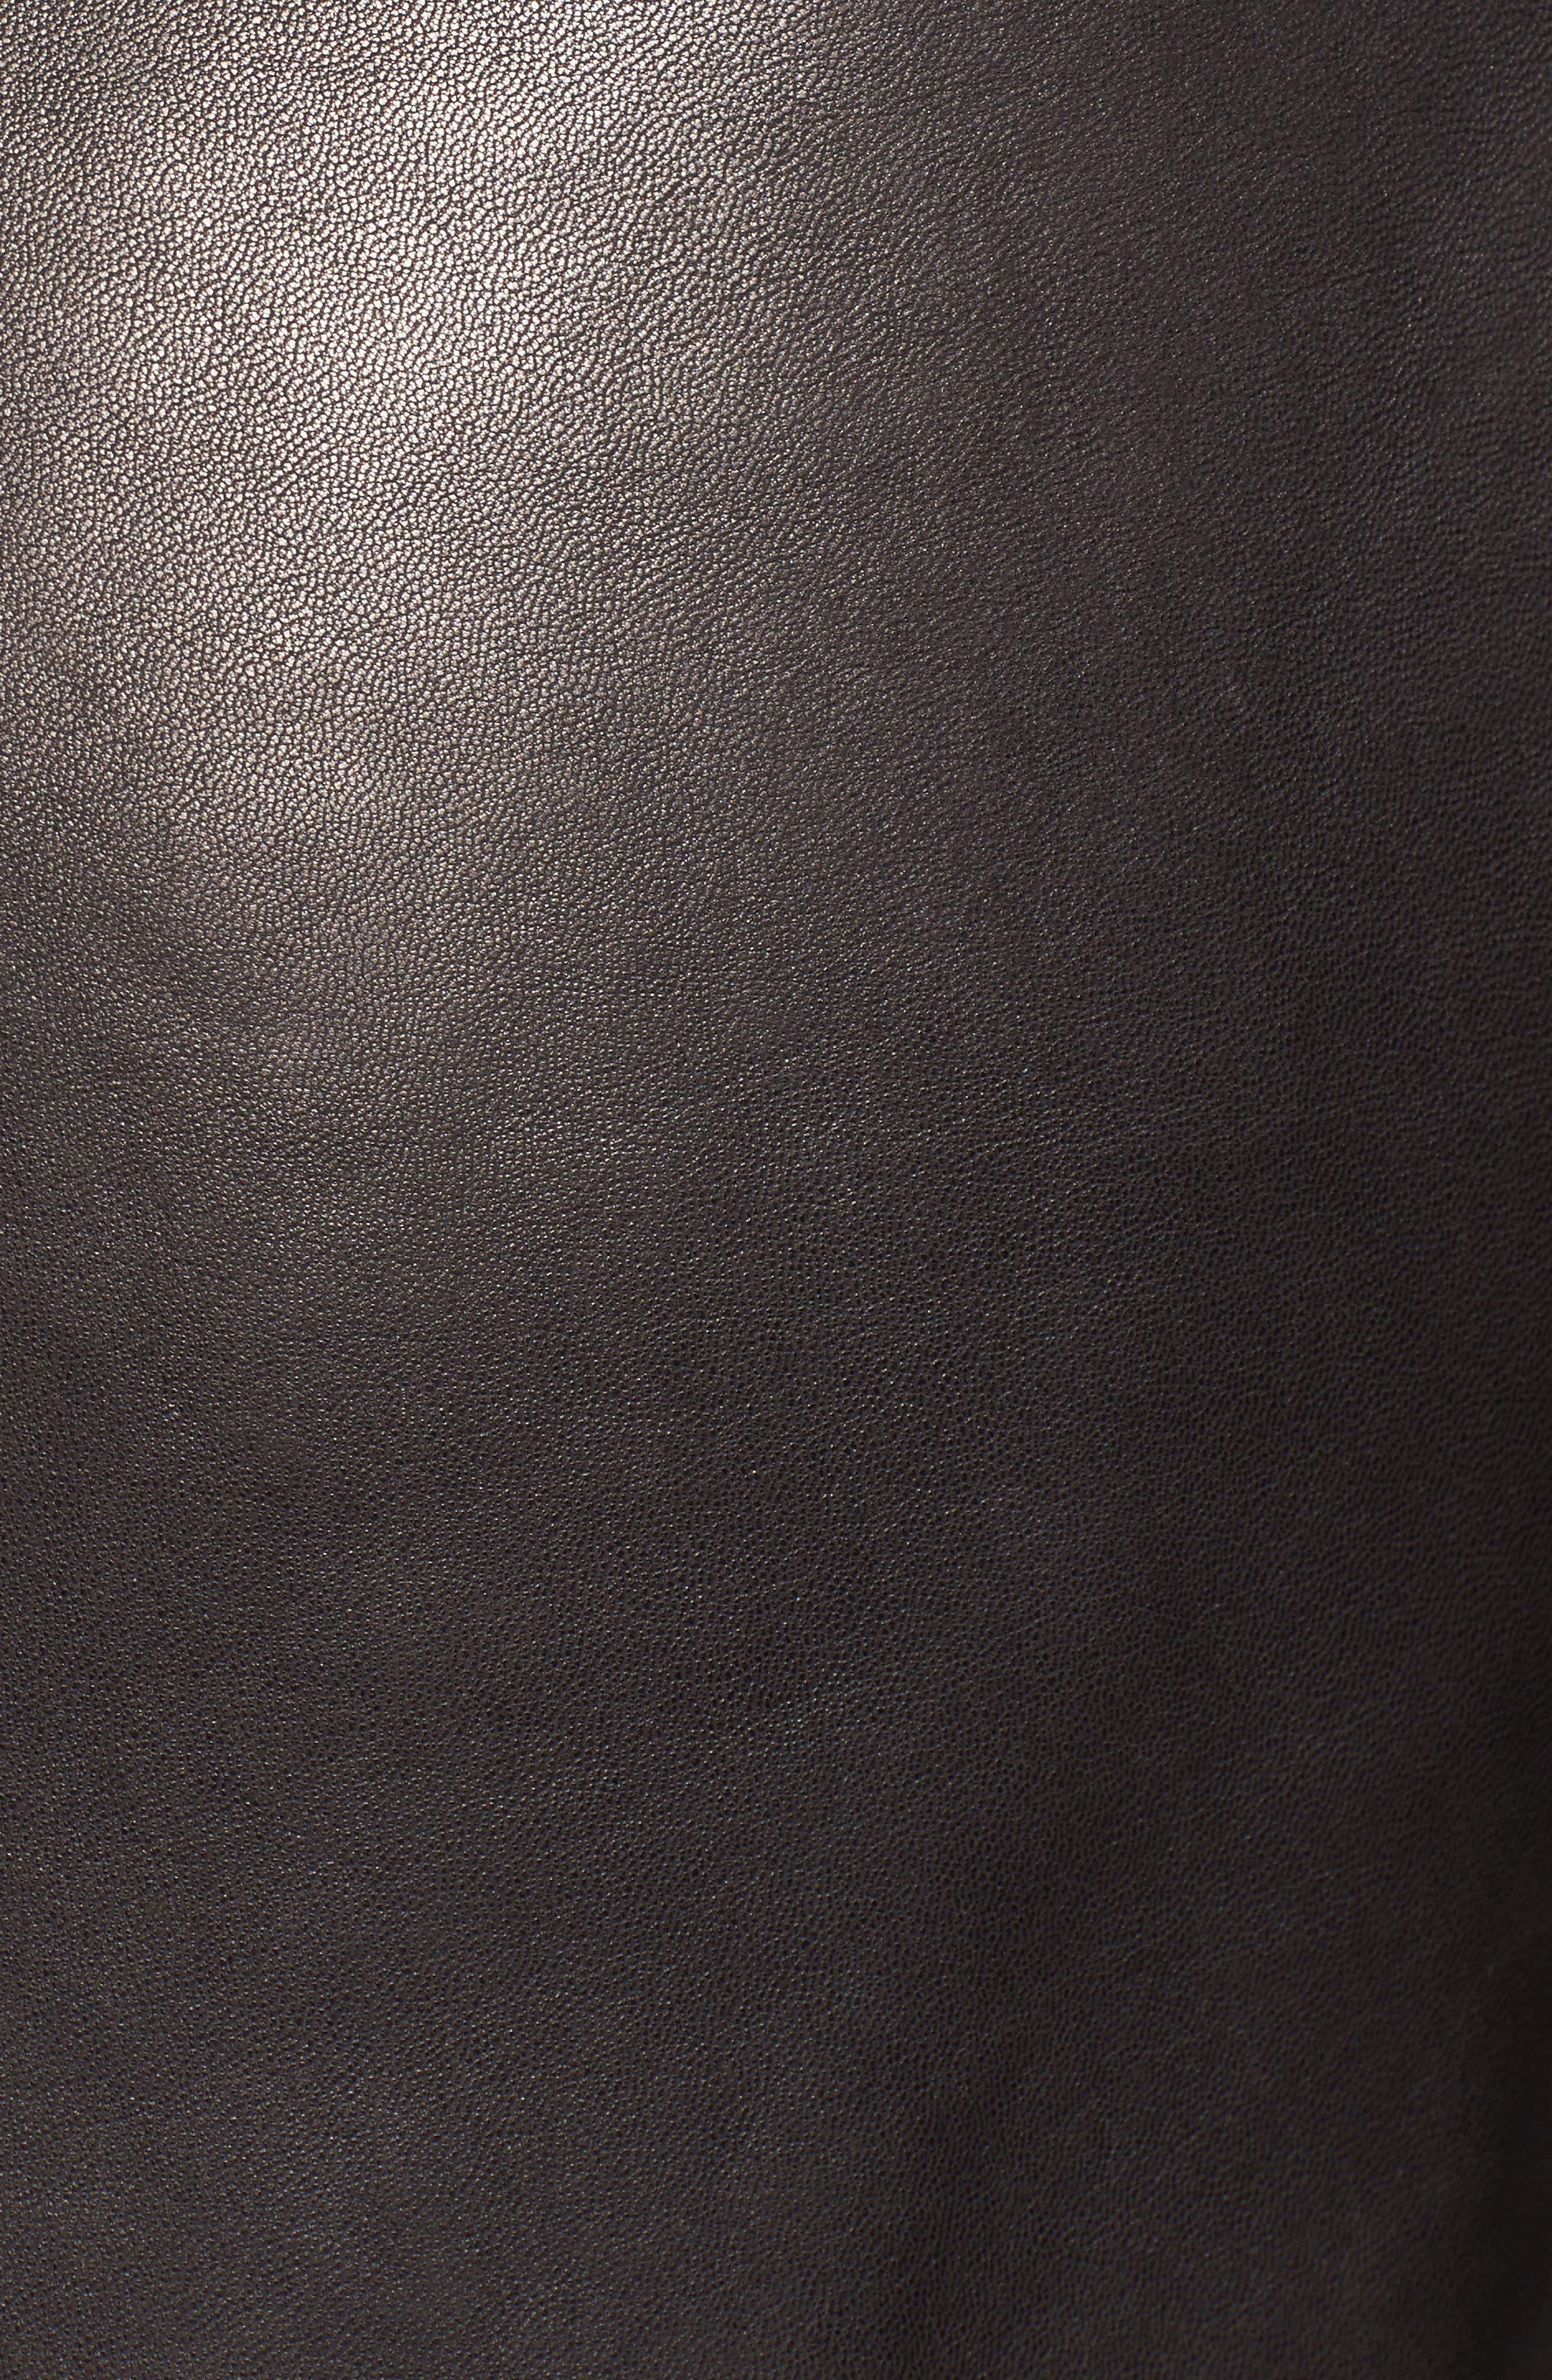 Tuers Lambskin Leather Moto Jacket,                             Alternate thumbnail 6, color,                             Black